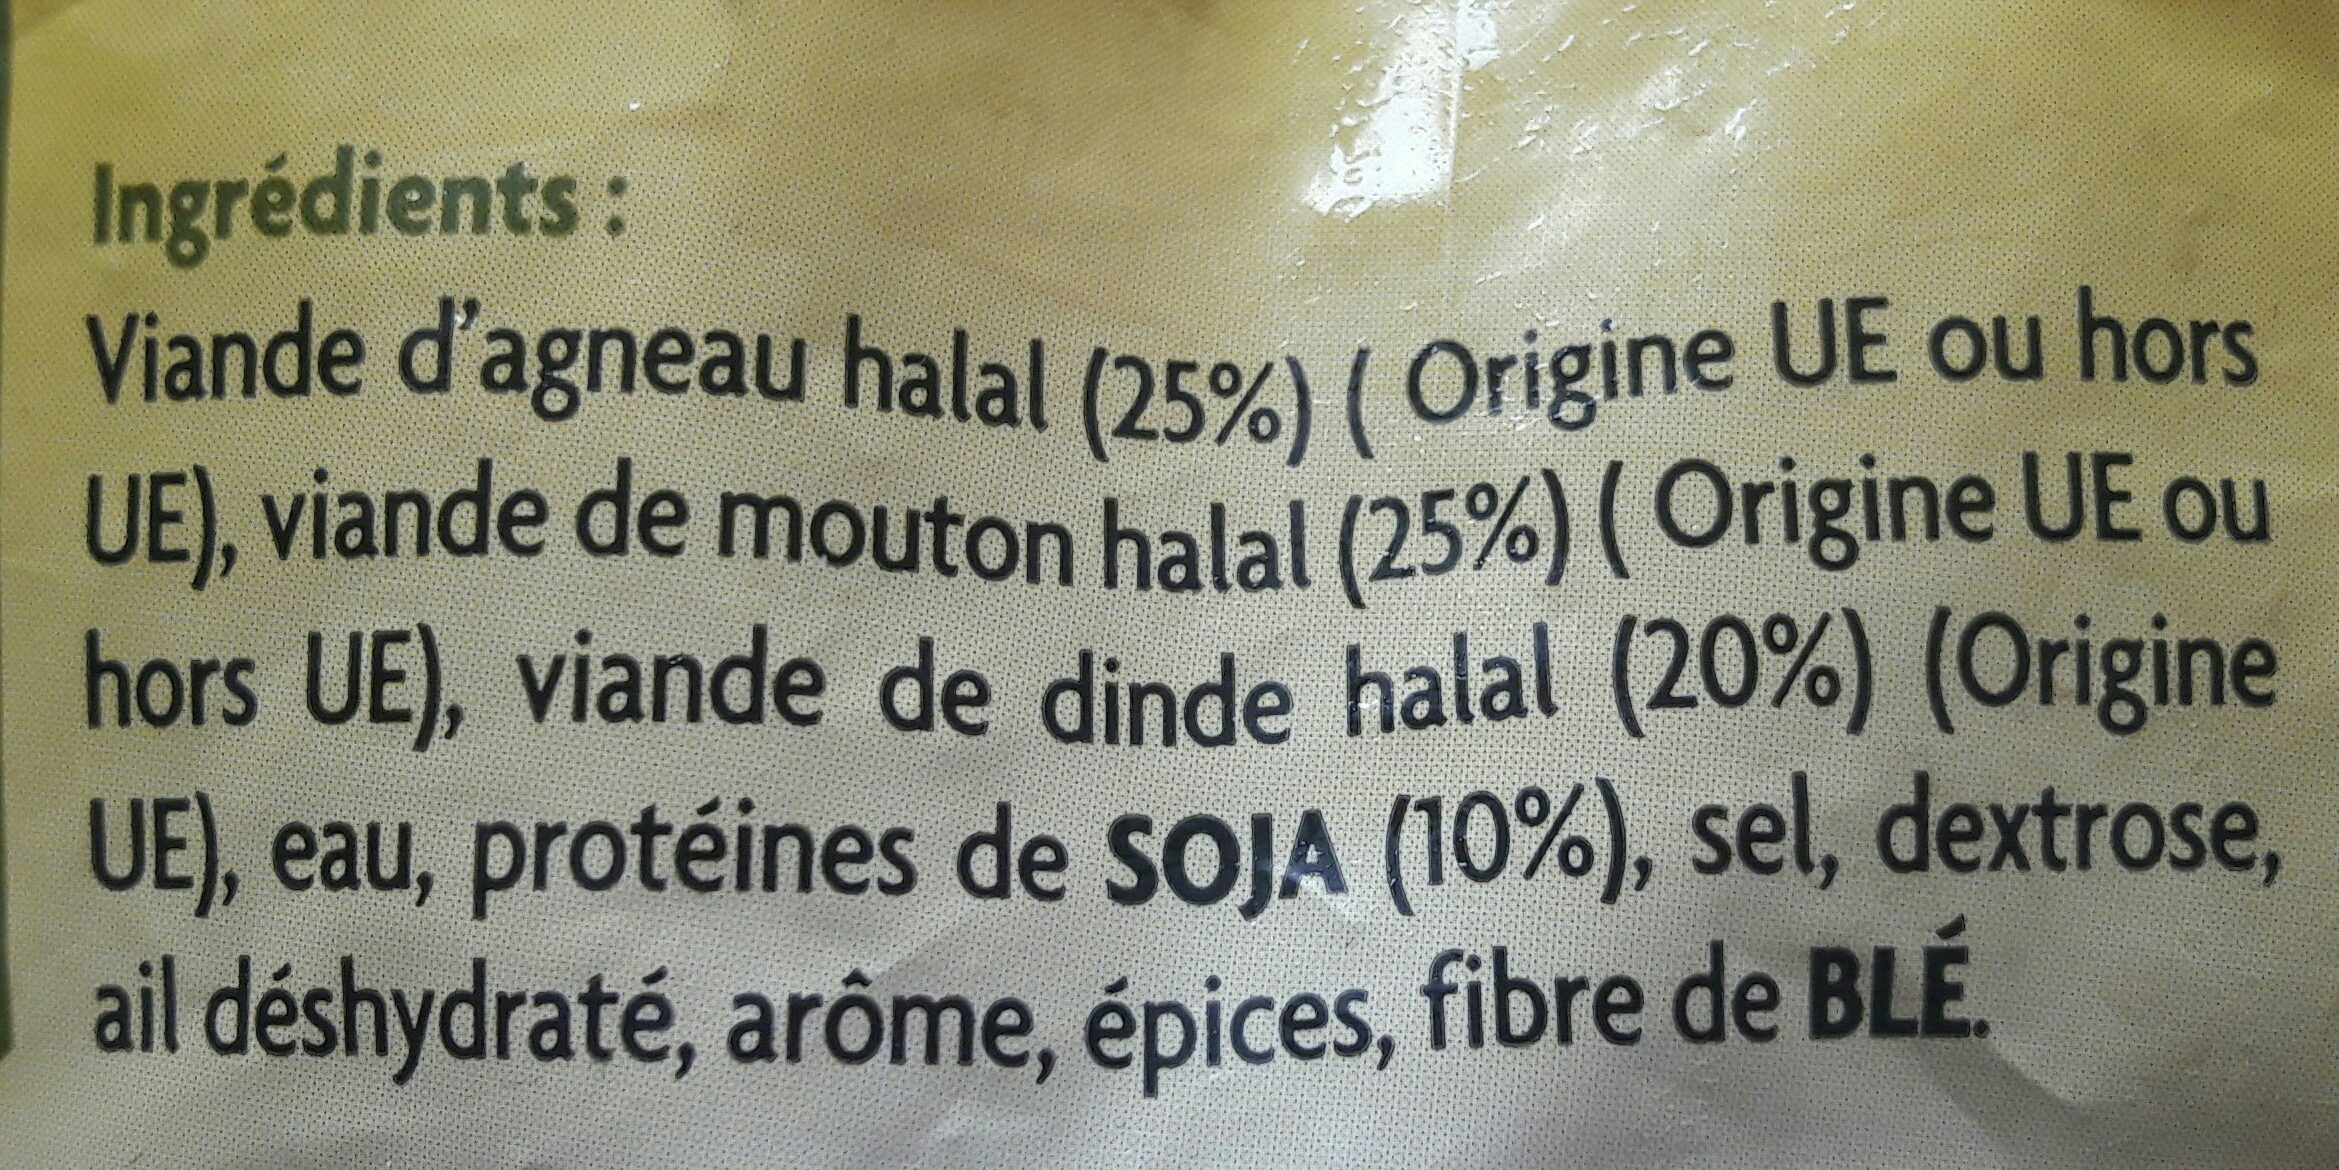 Boulette D'agneau Halal x33 -1kg - Ingrediënten